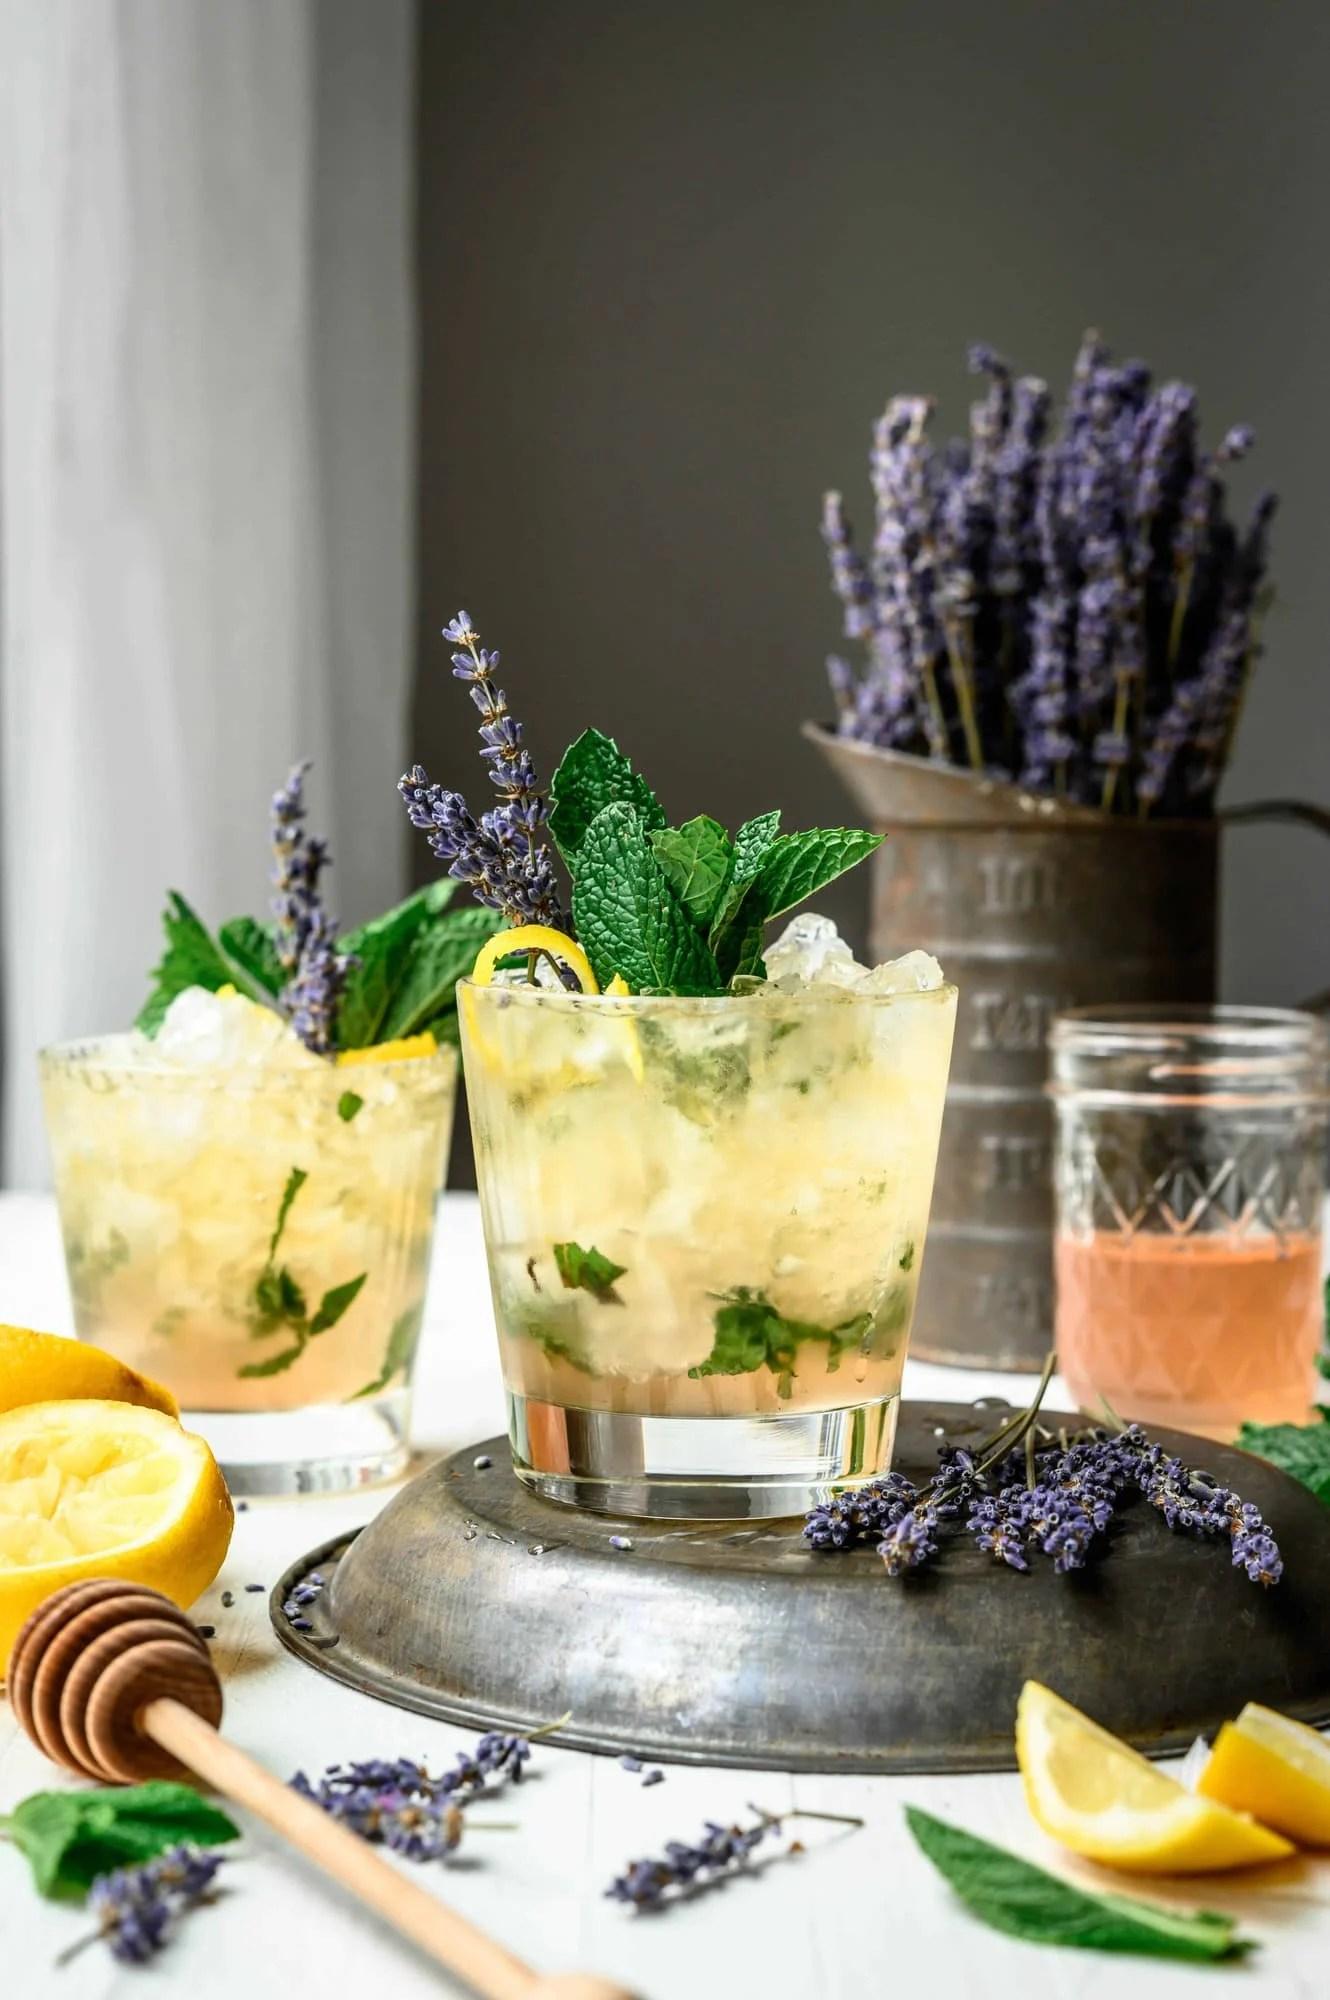 Side view of lemon lavender mint julep on white table